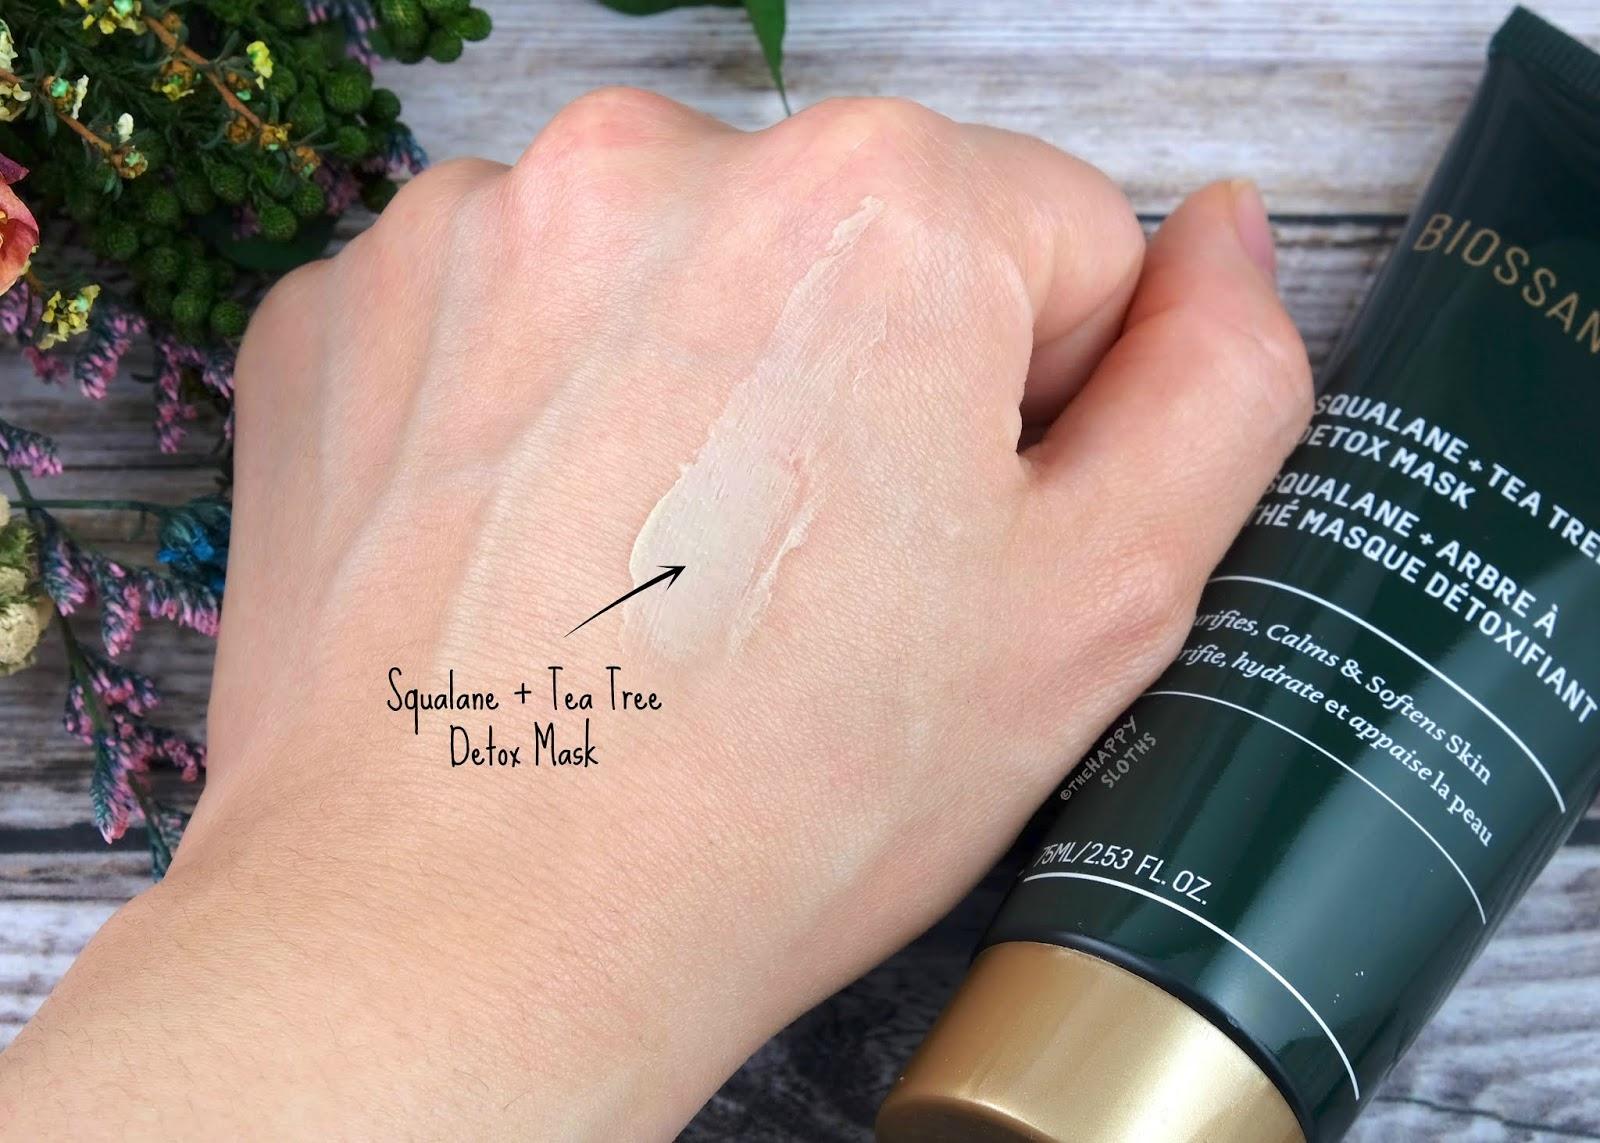 Biossance   Squalane + Tea Tree Detox Mask: Review